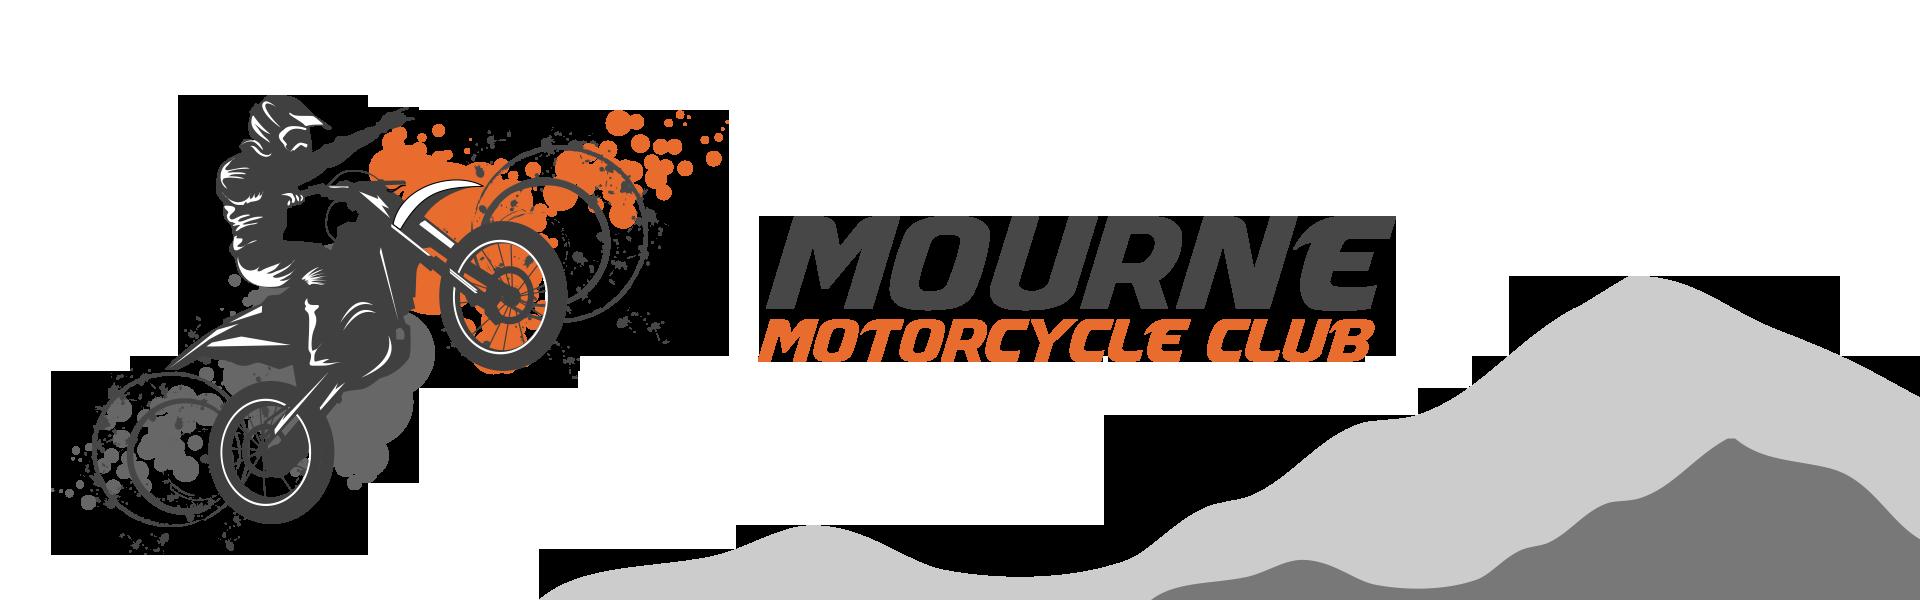 Mourne Motorcyle